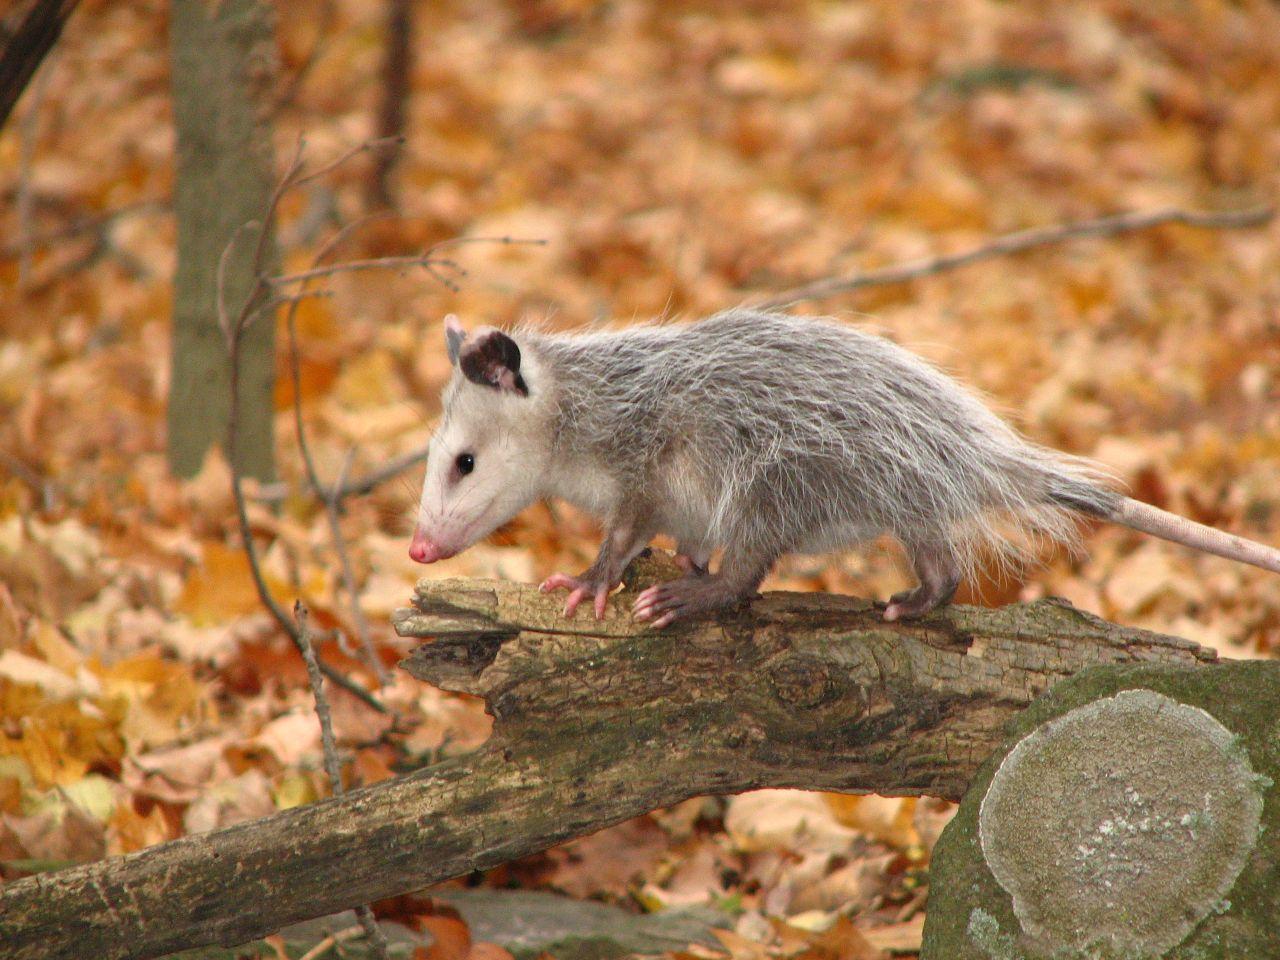 Fiesta Toys Plush Opossum Possum Plush   amazoncom